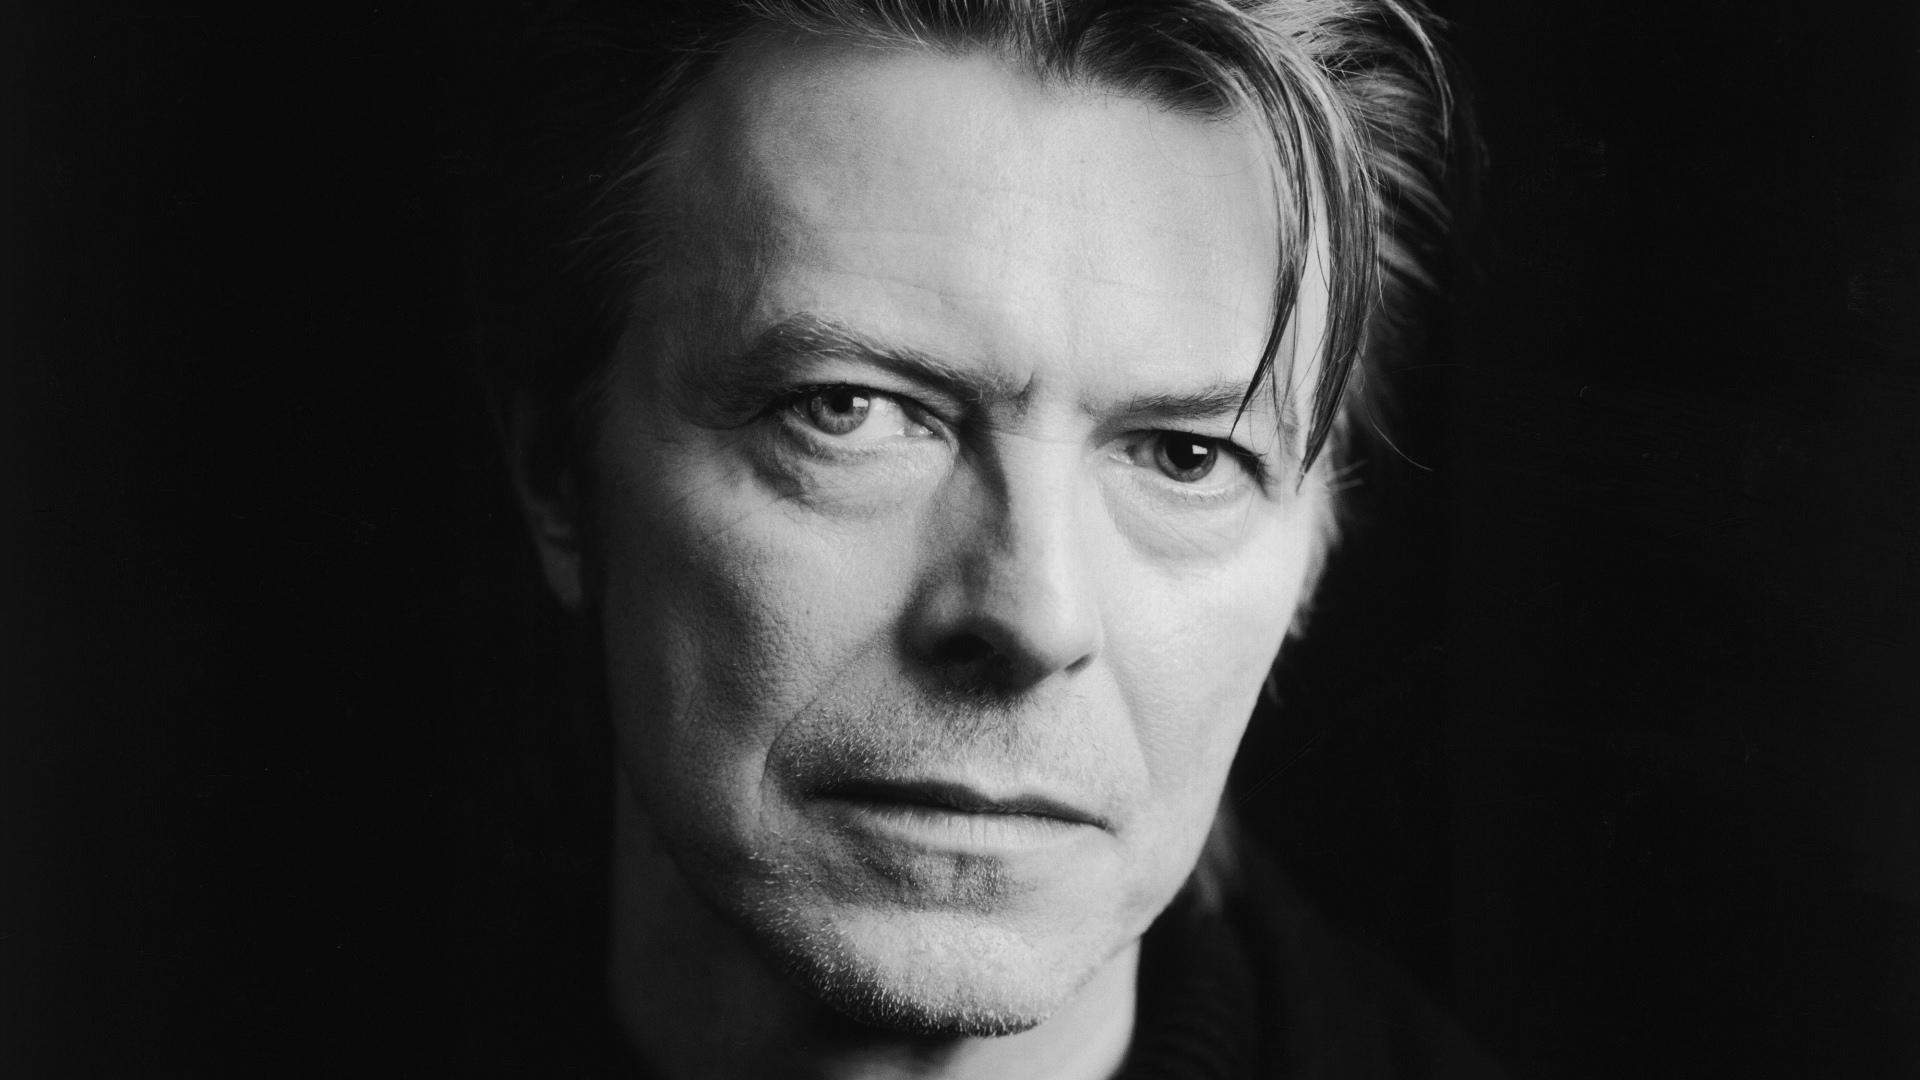 david David Bowie